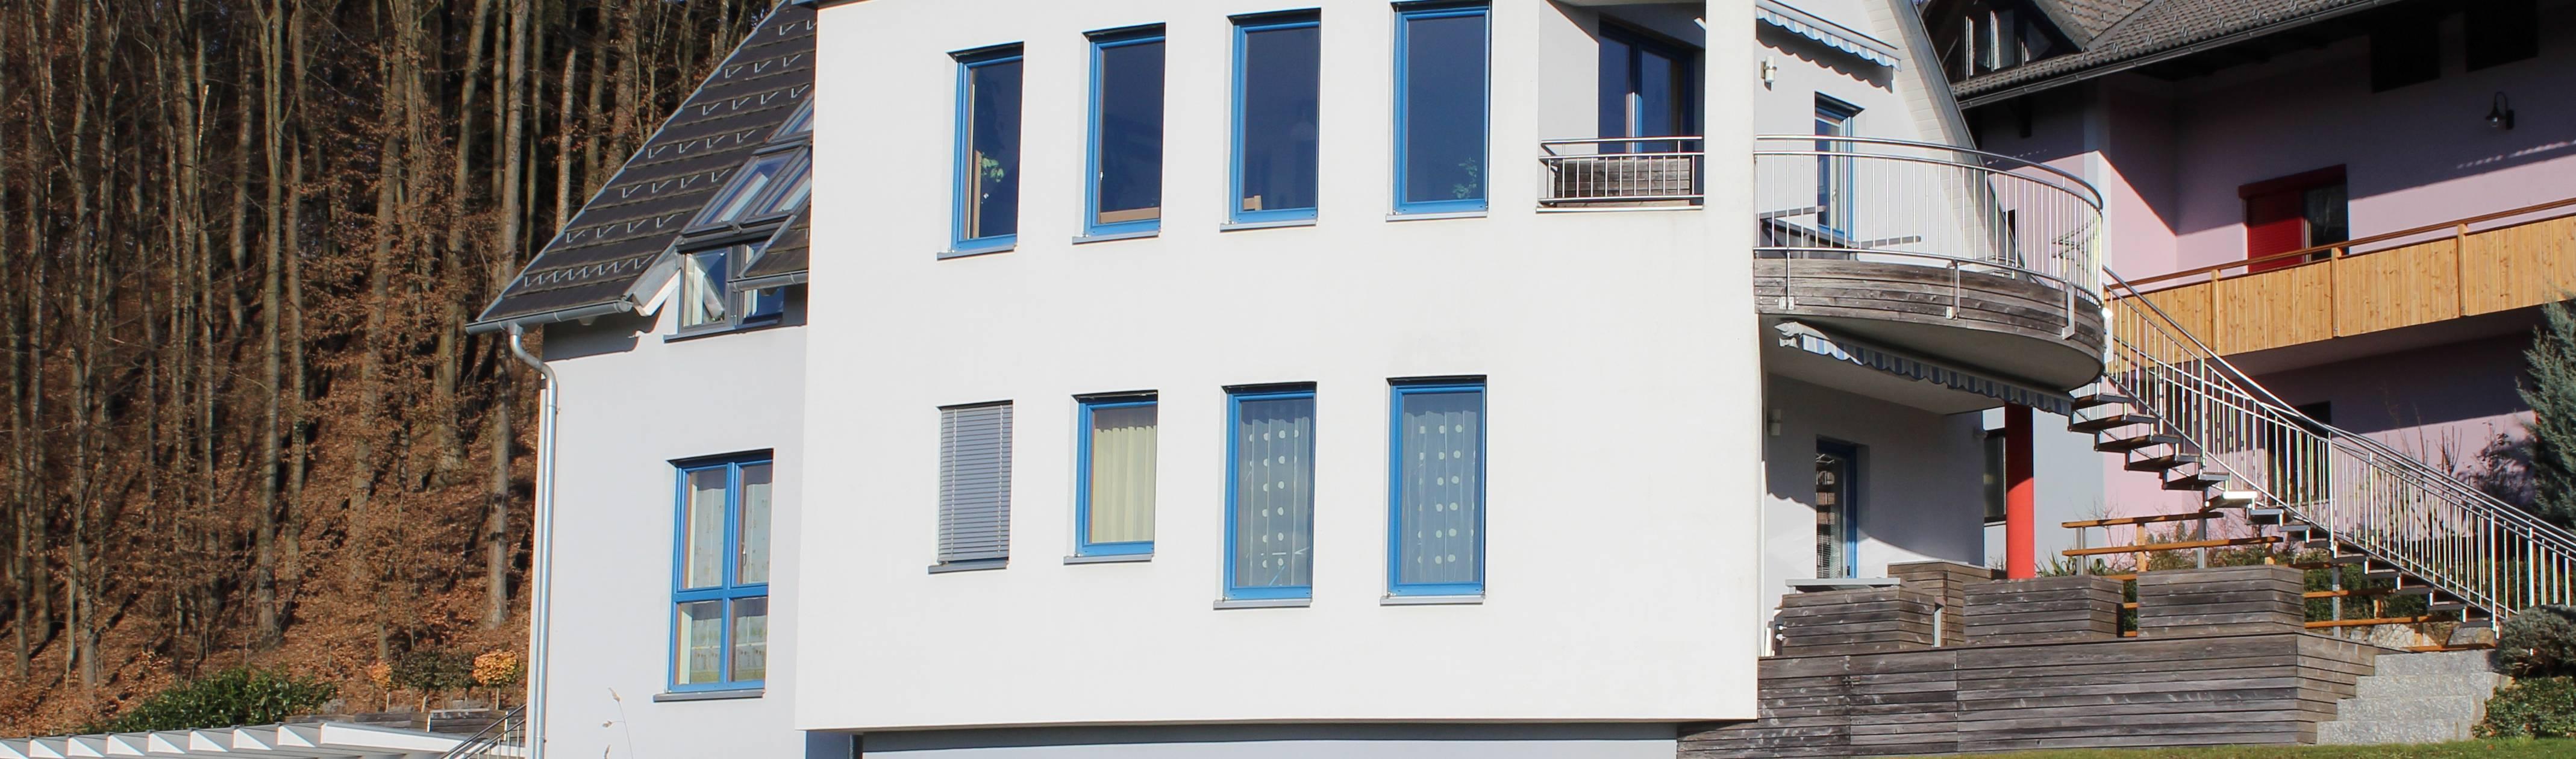 BAUWERKSTATT; Bau- & Planungsbüro; DI Thomas Riedl e.U